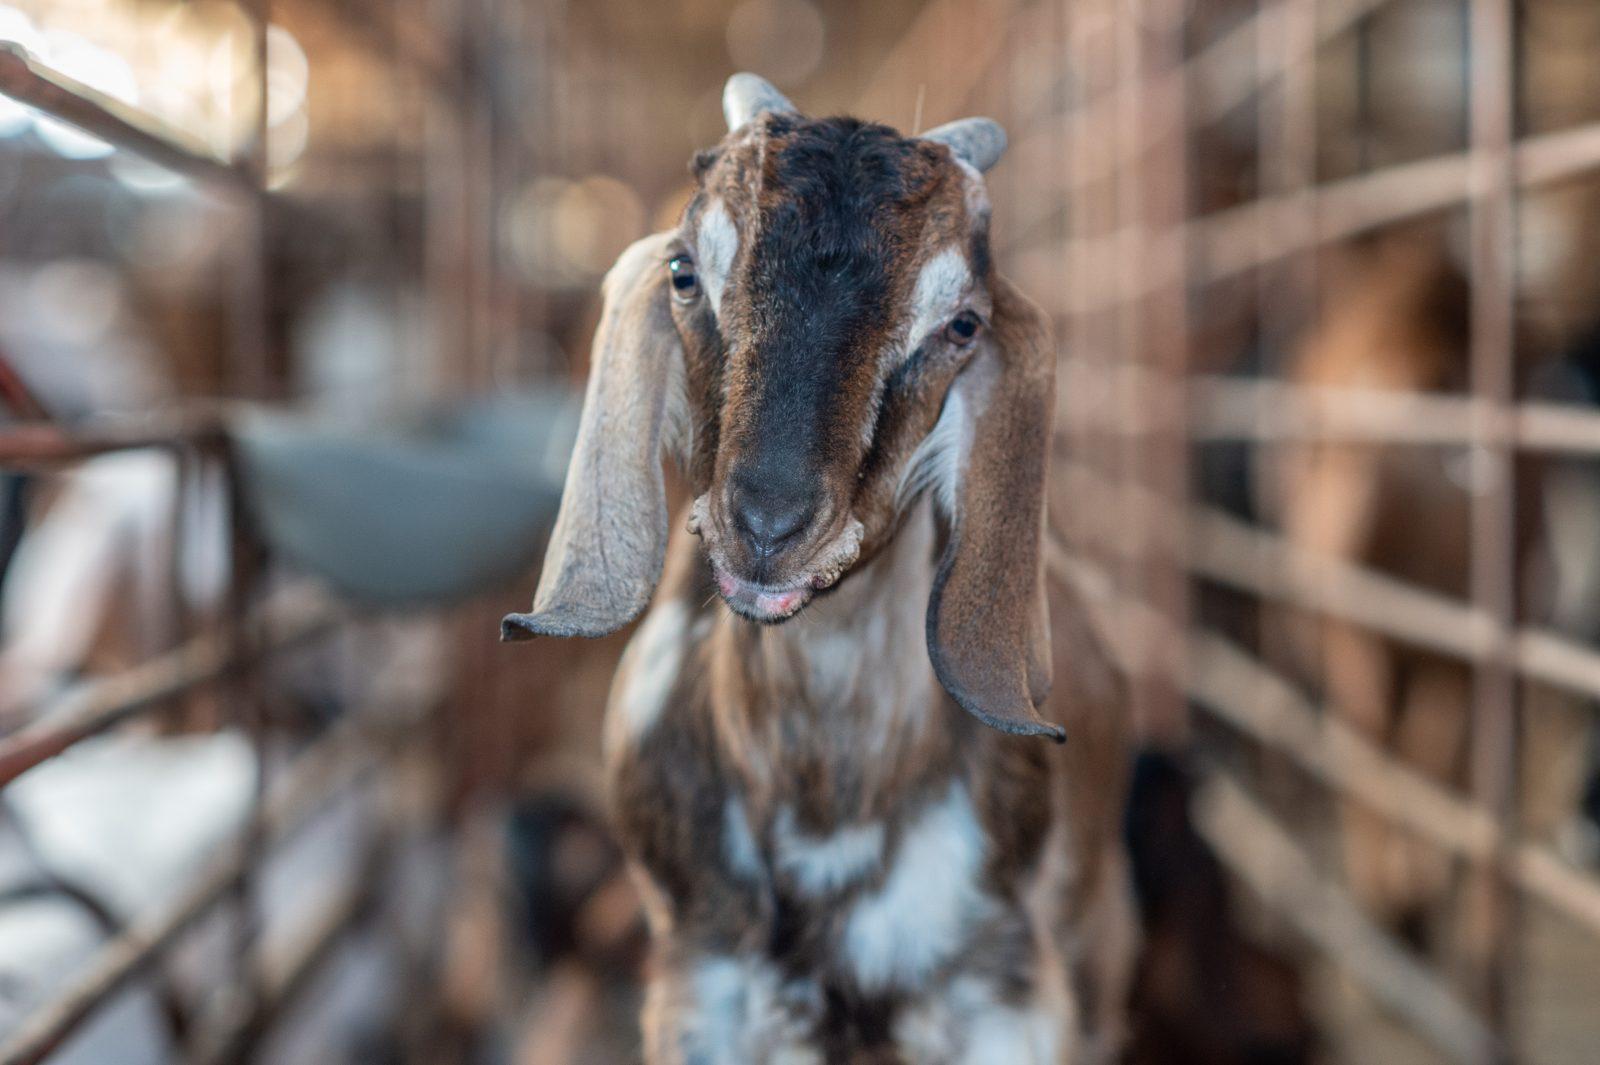 Intensive goat farming. Taiwan, 2019